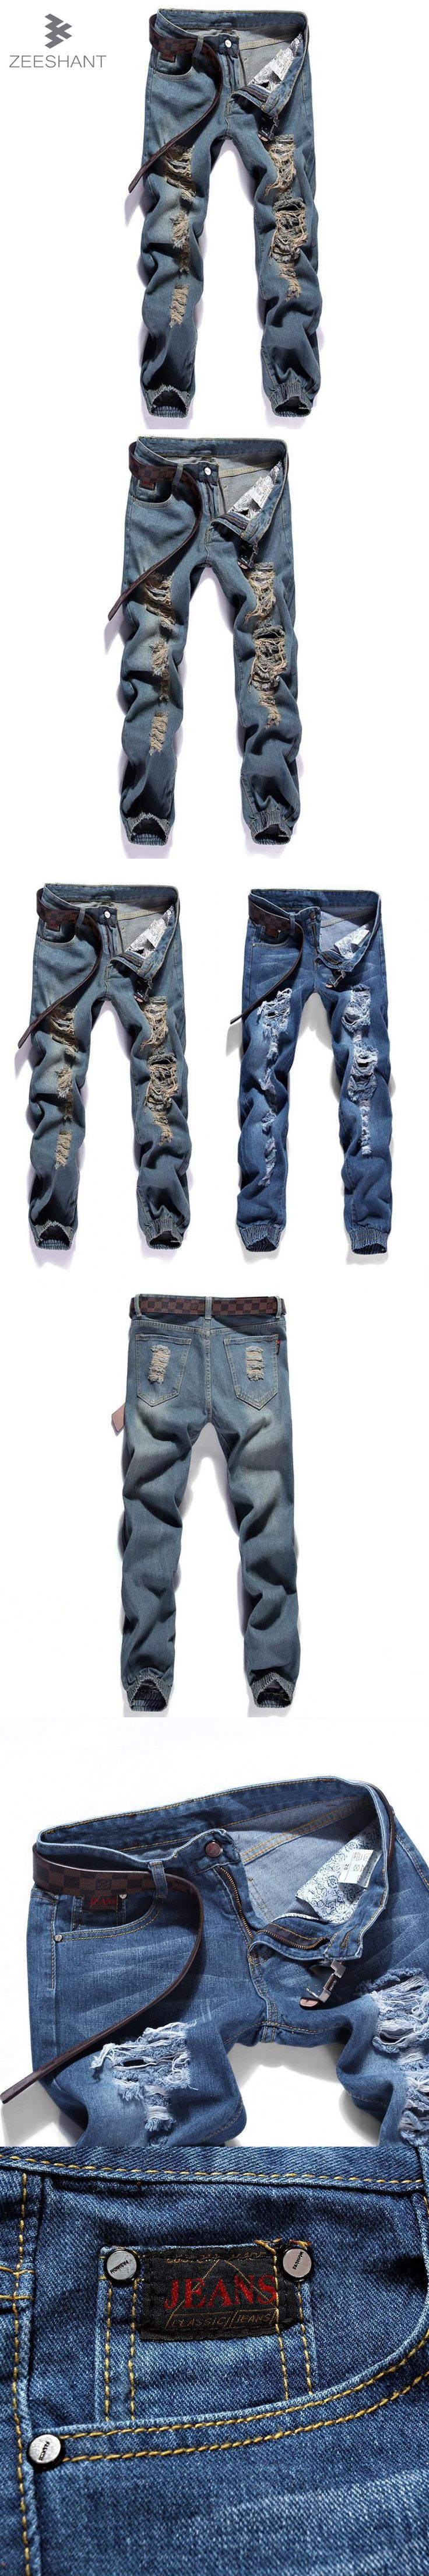 ZEESHAT Homme Jeans Designer Pants Destroyed Mens Slim Denim Straight Skinny Jeans Men Ripped hole Jeans Skinny in Men's Jeans